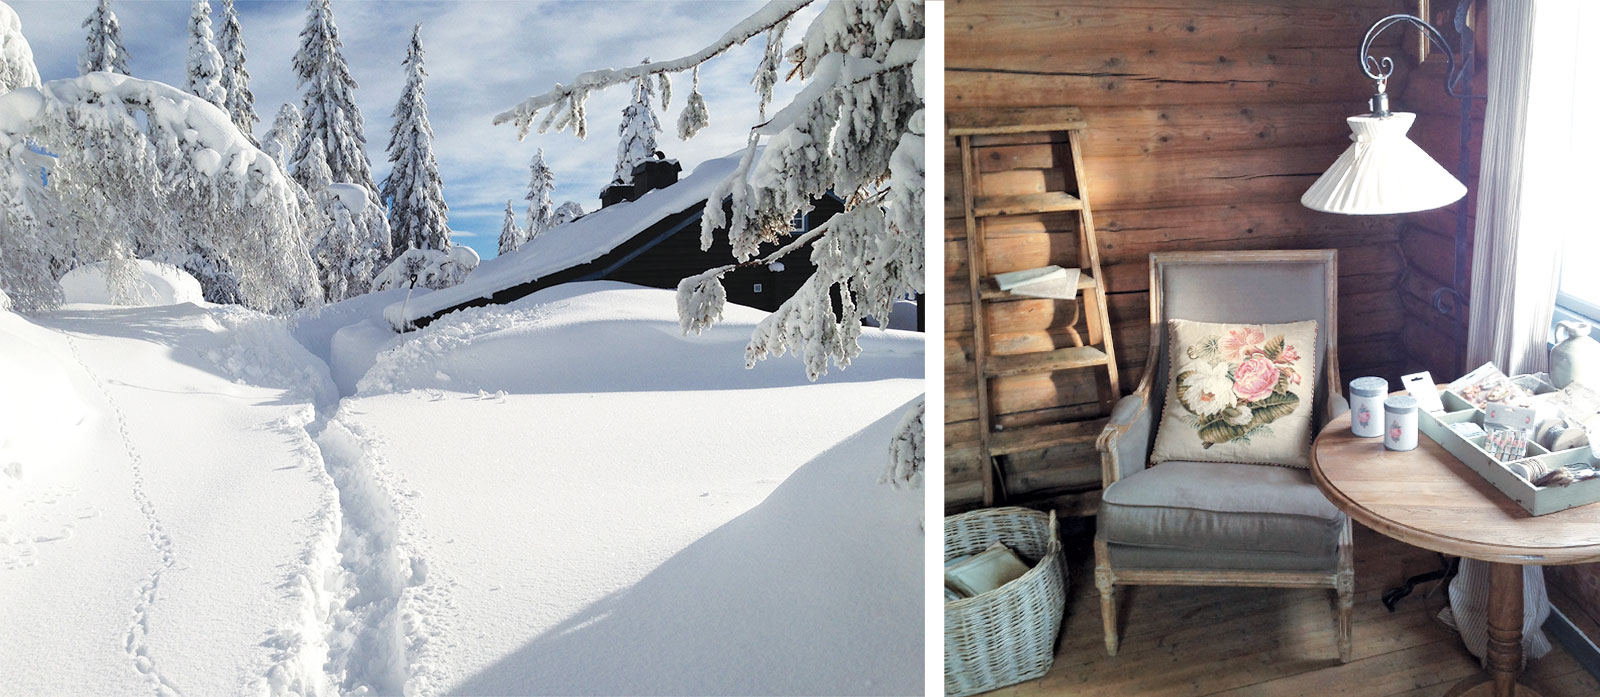 Snowy-intro